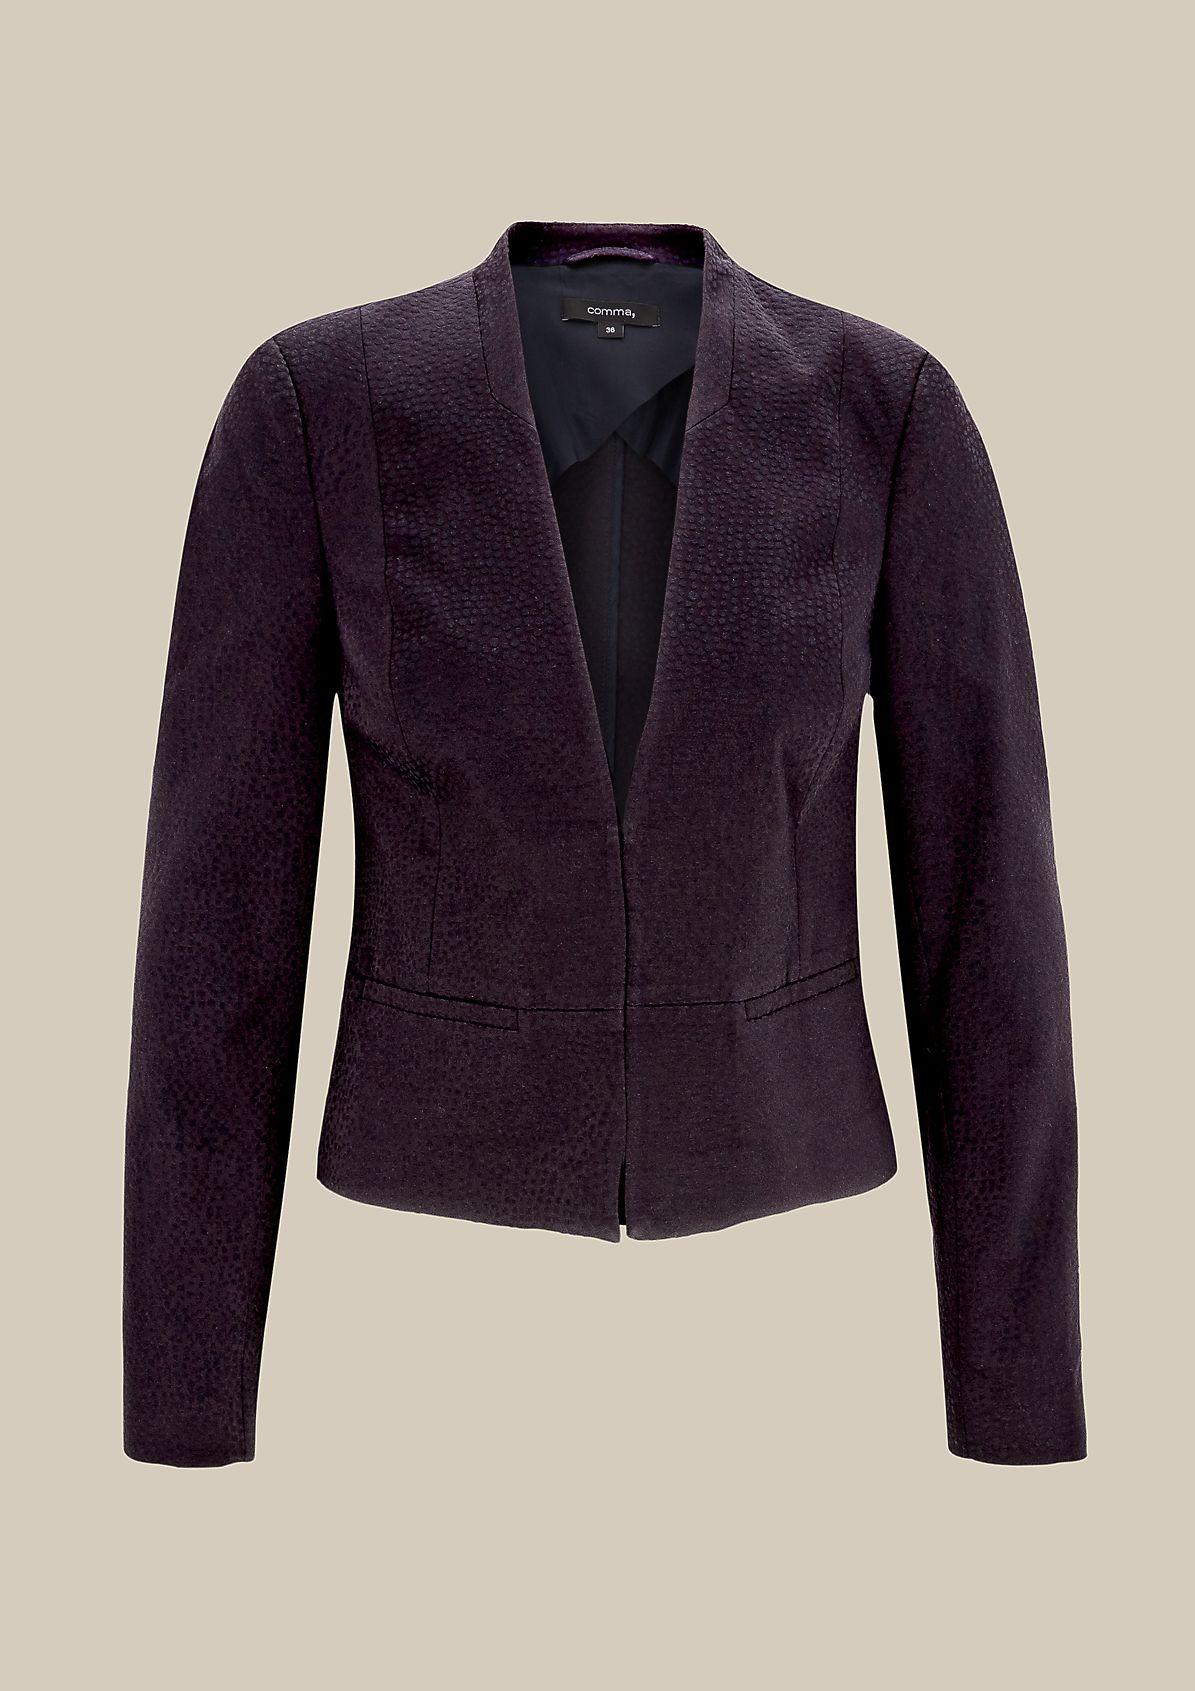 Elegant short blazer with a fine jacquard pattern from s.Oliver